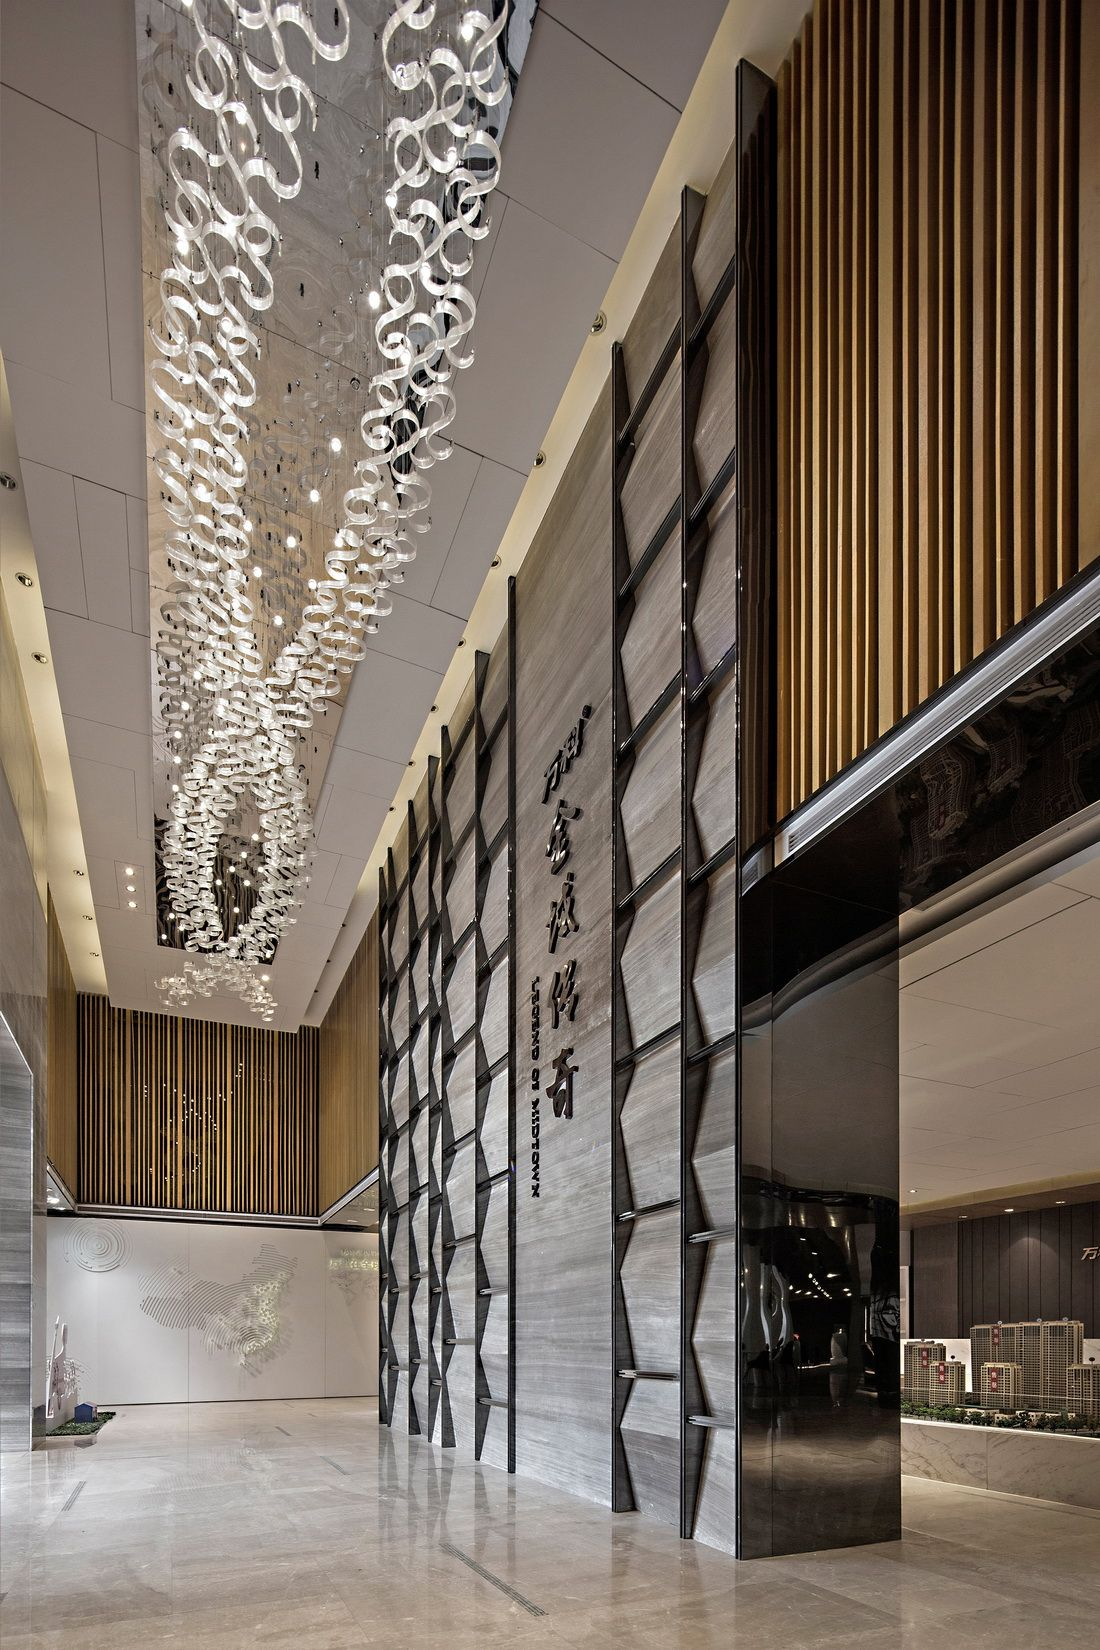 Puredesigncn Admin Uimages Reception DesksLobby Hotel